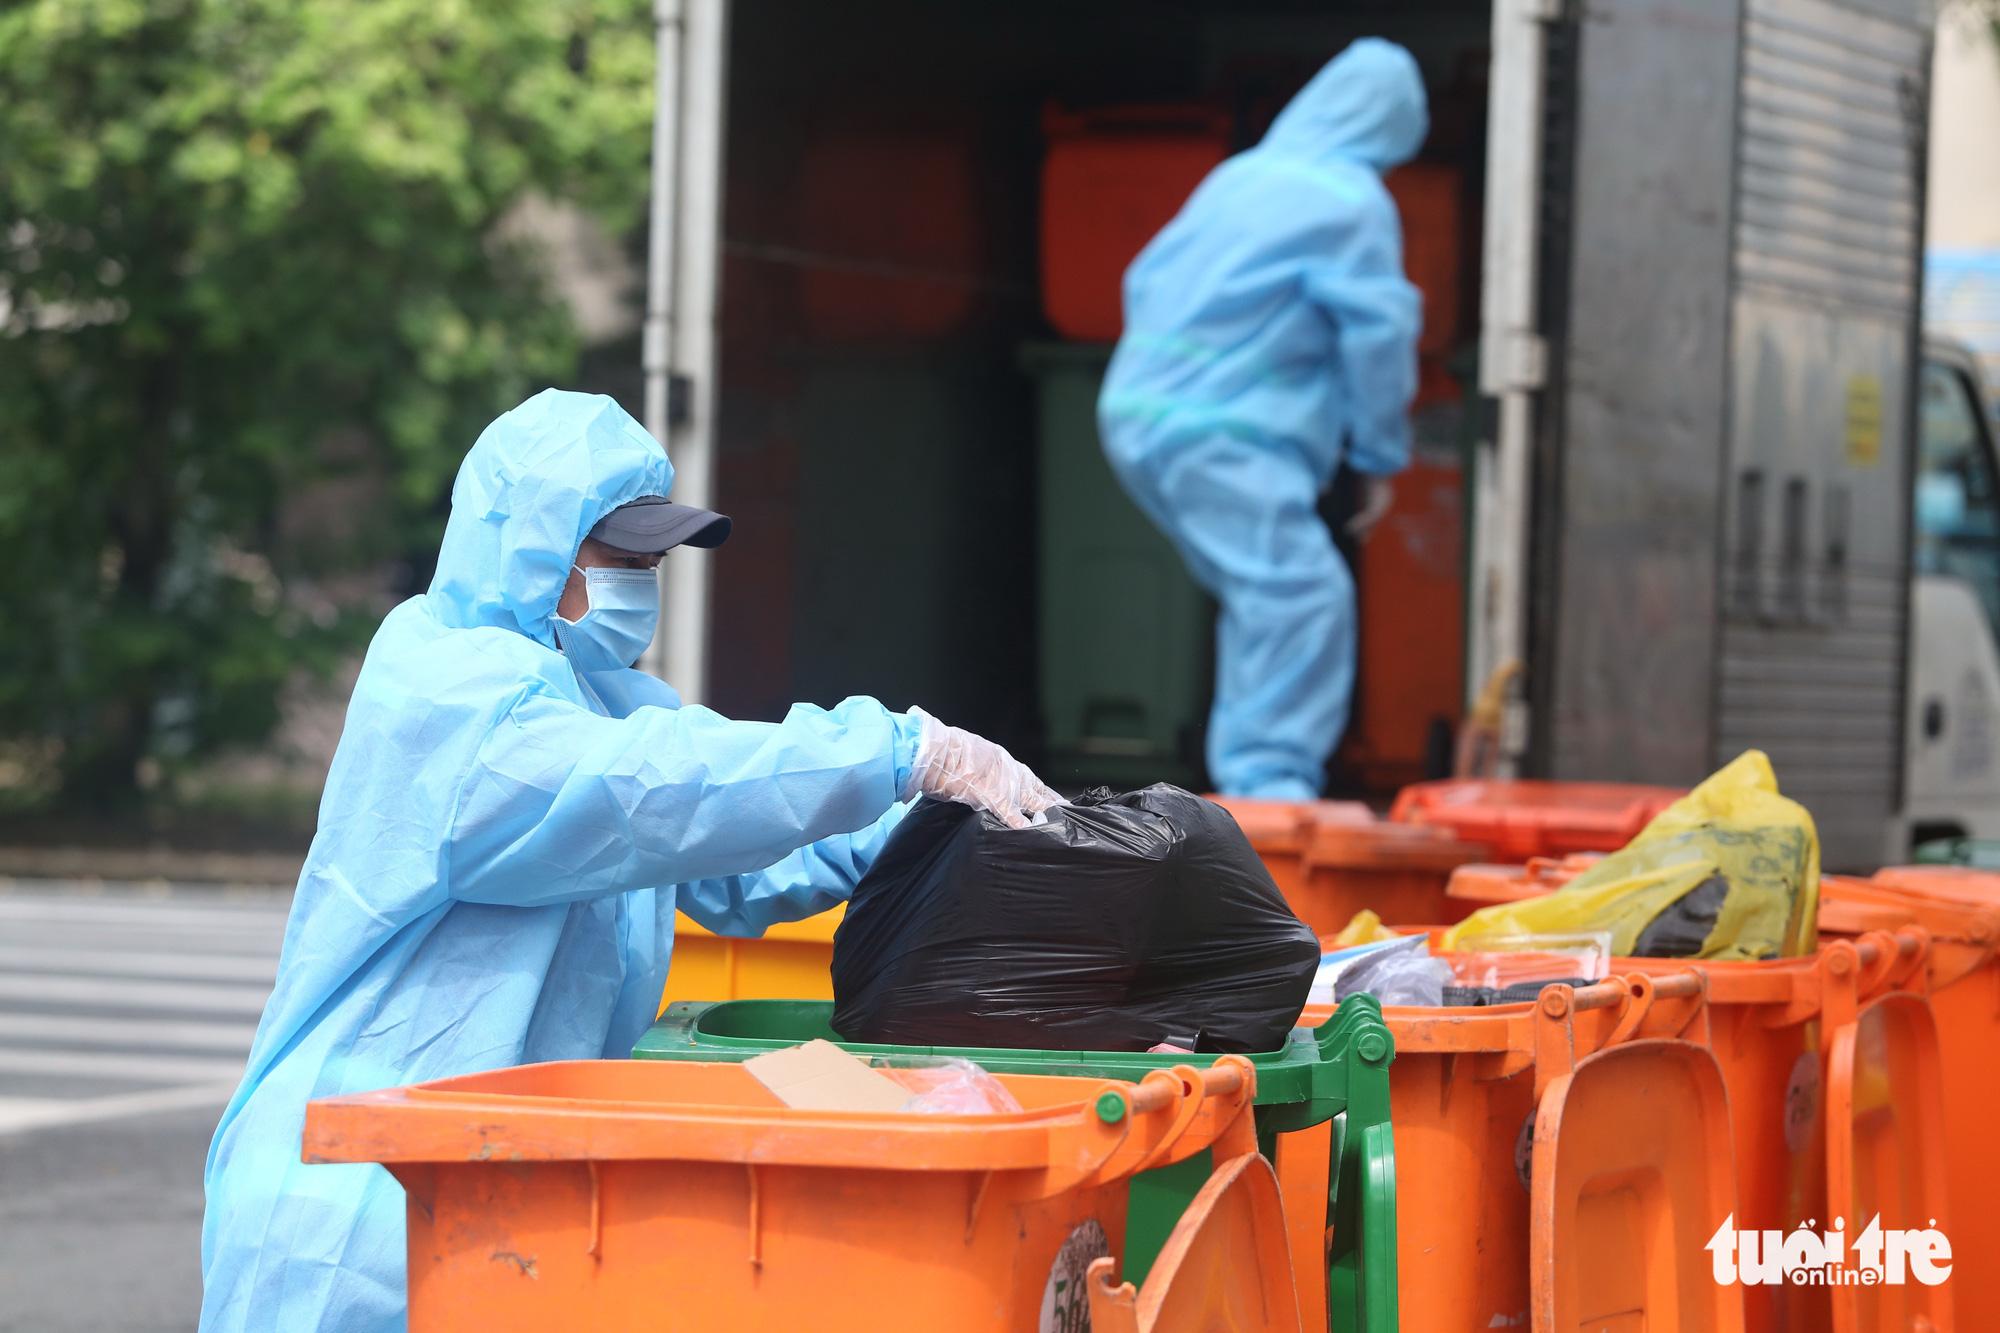 Ho Chi Minh City operates more incinerators to treat massive COVID-19 waste